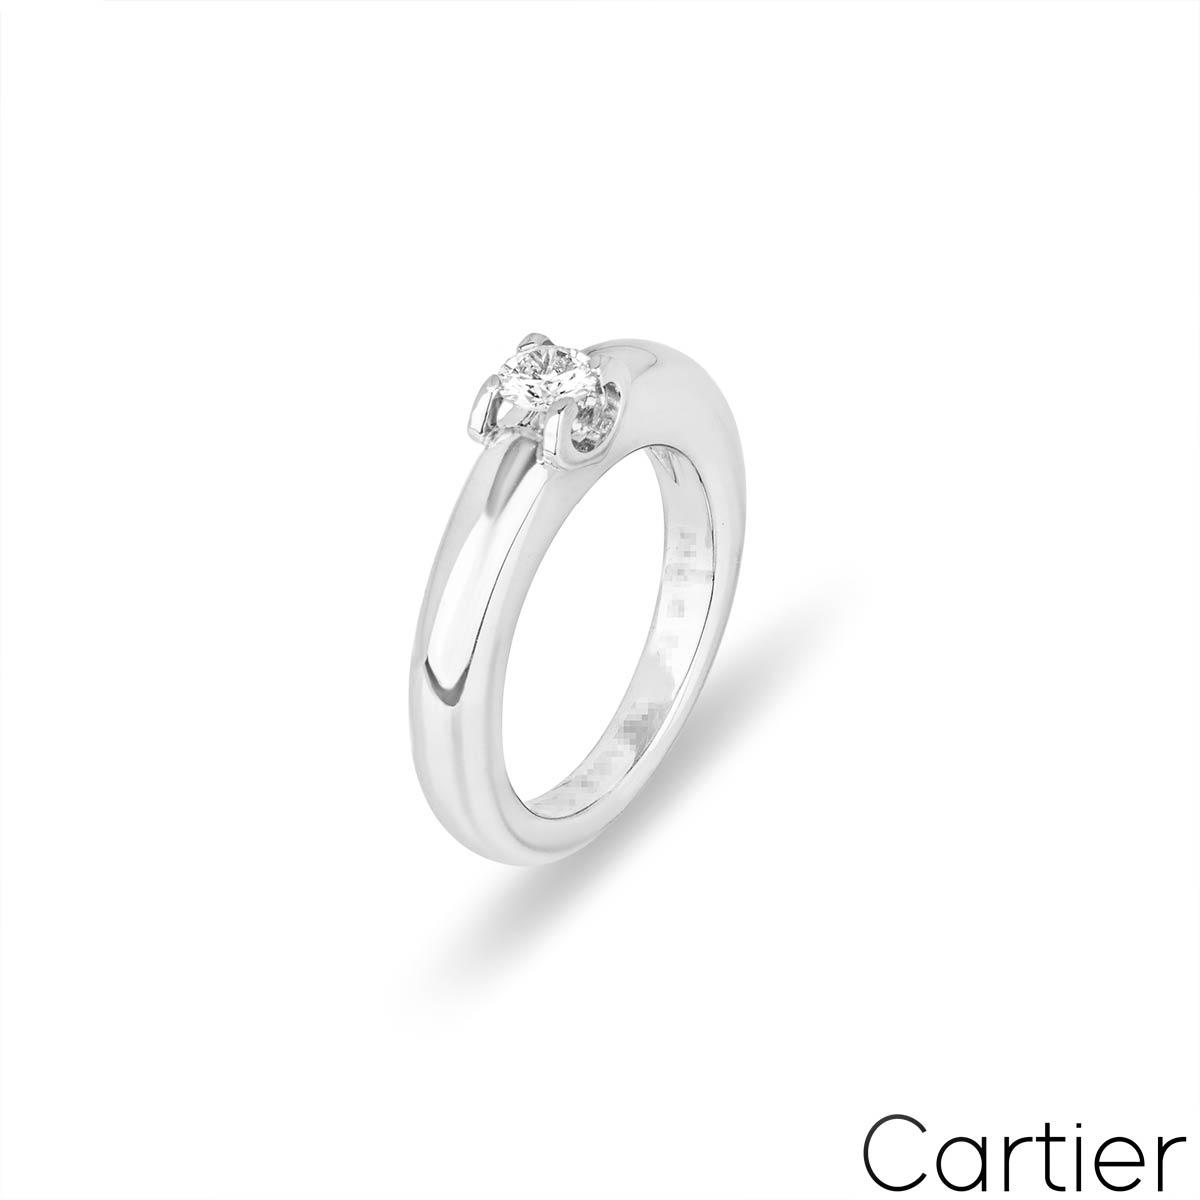 Cartier White Gold Diamond C De Cartier Ring Size 48